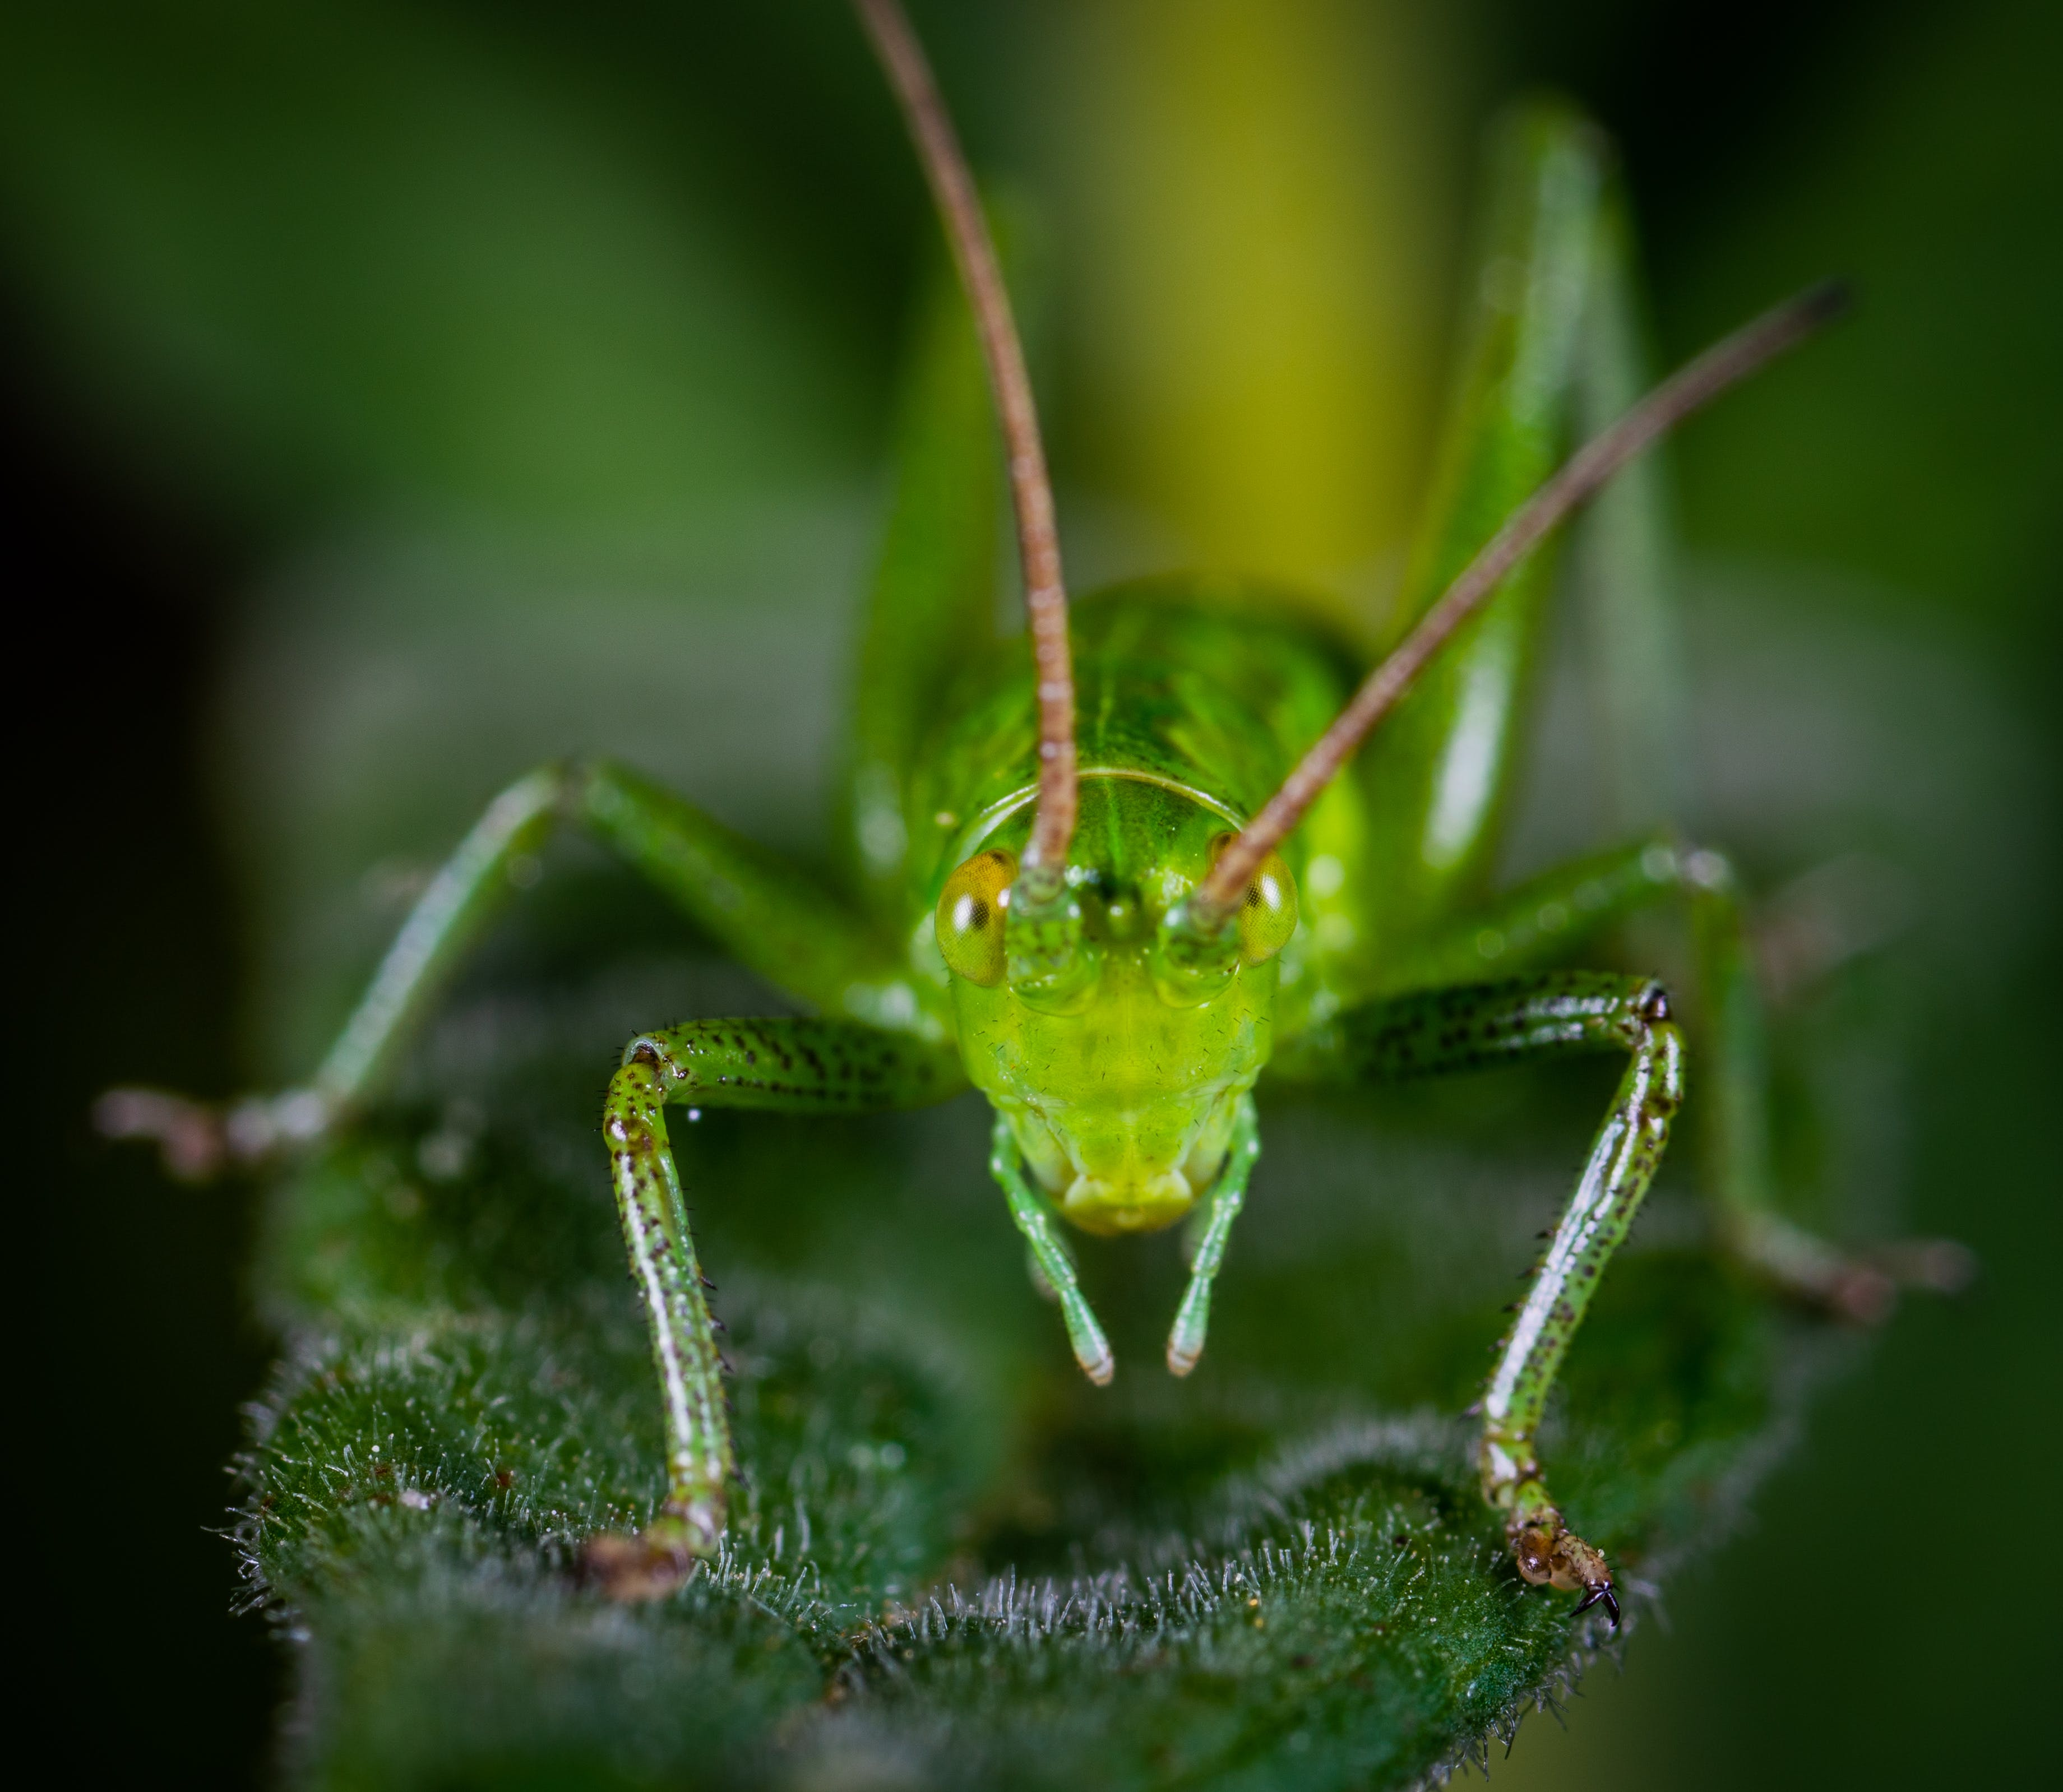 Macro Shot of Green Grasshopper on Leaf